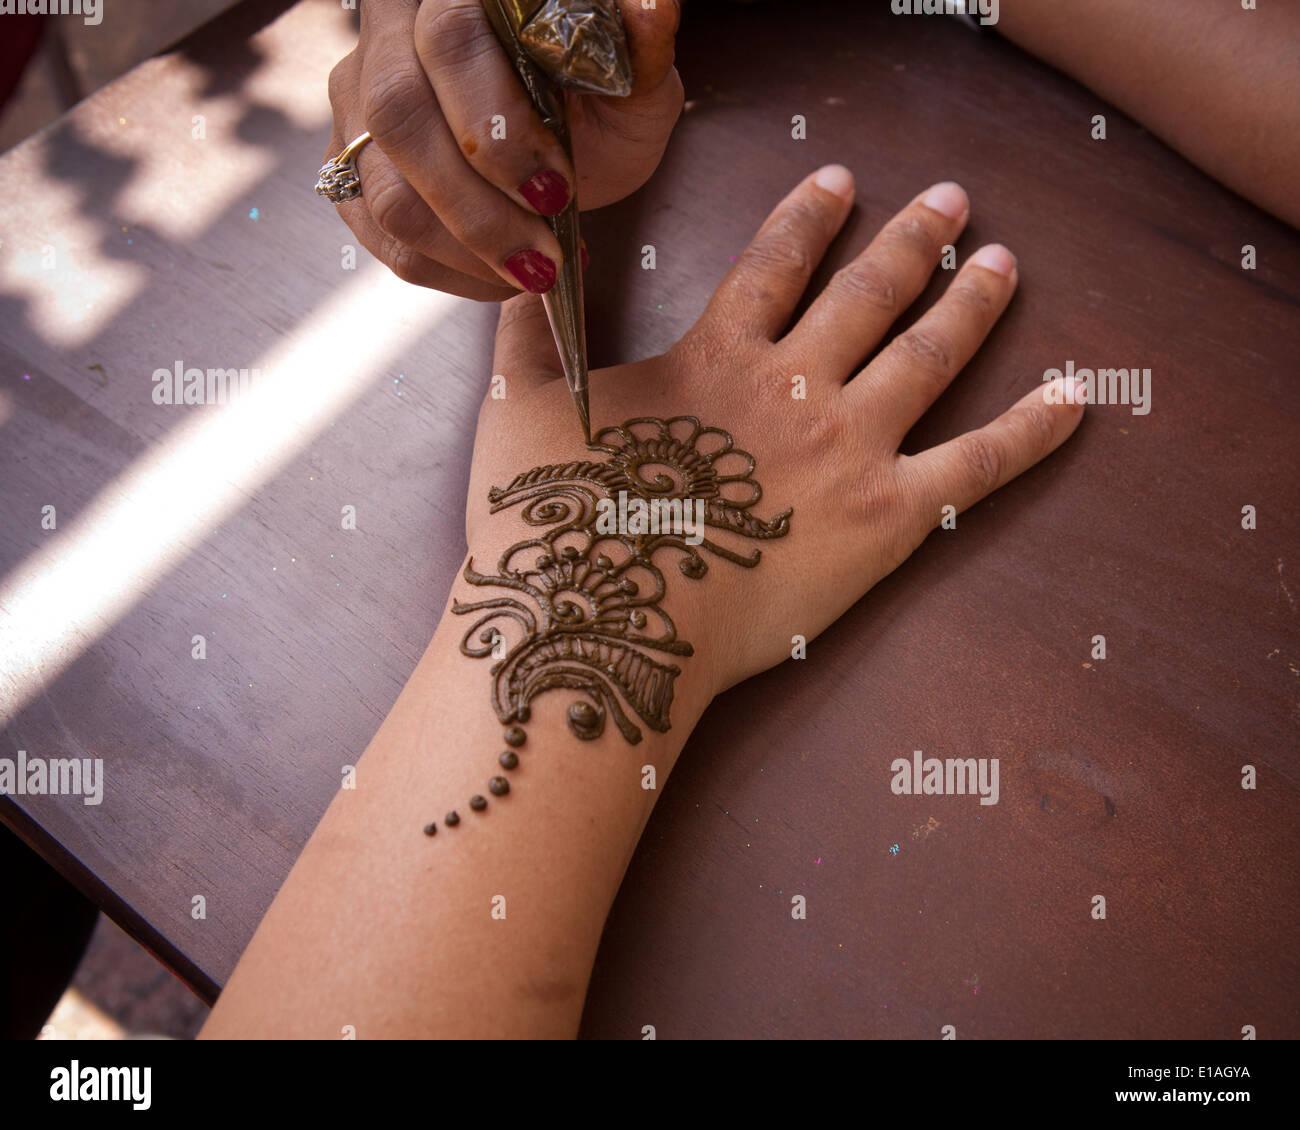 Woman getting henna design on hand - Stock Image